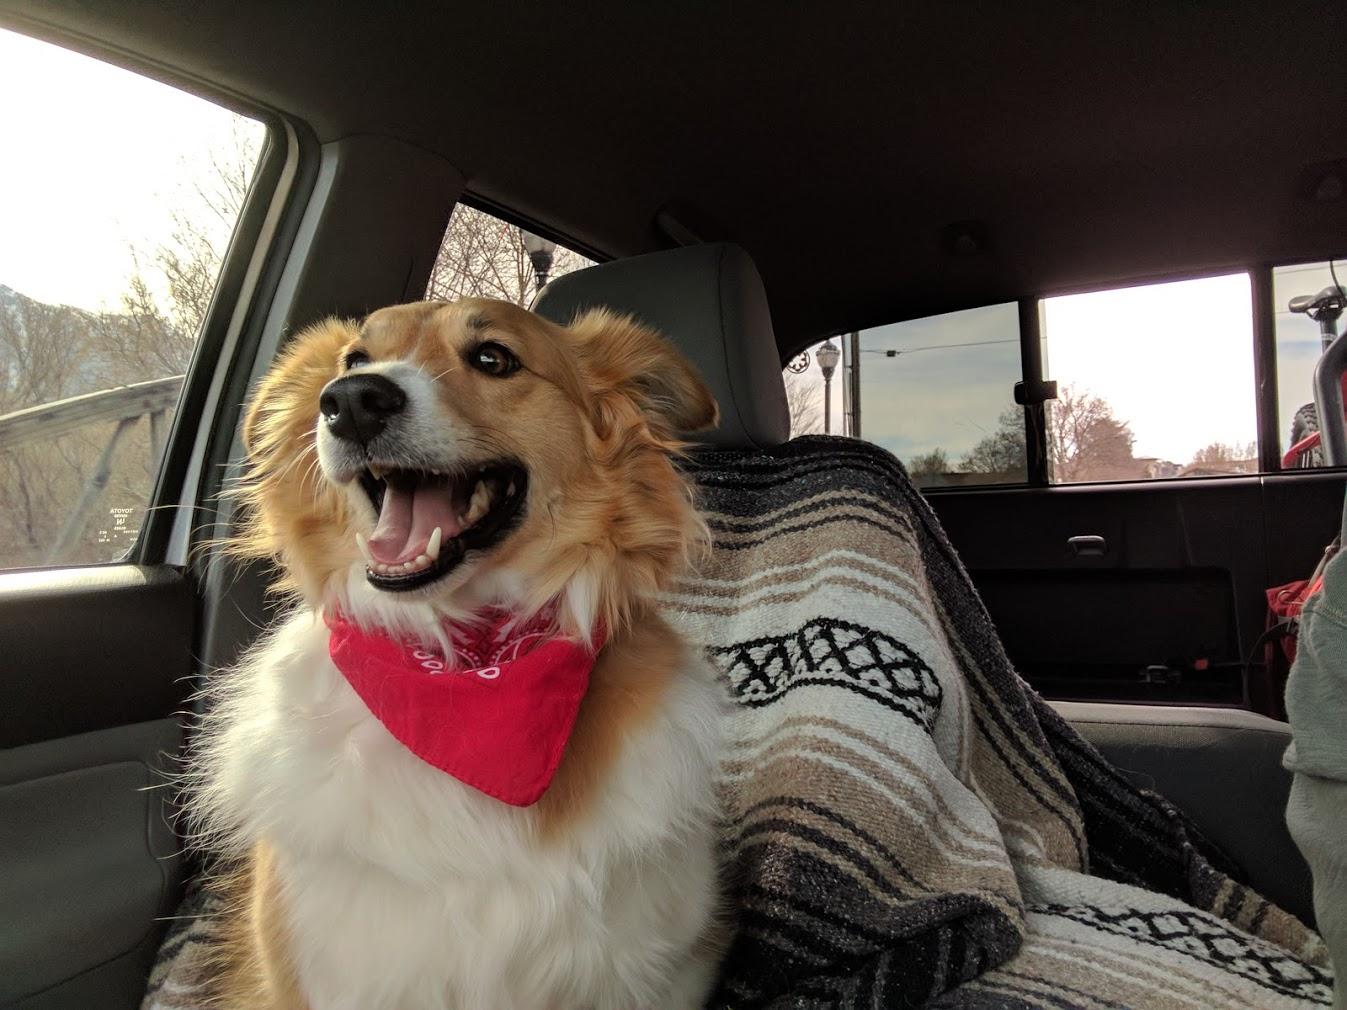 cute dog wearing a red bandana